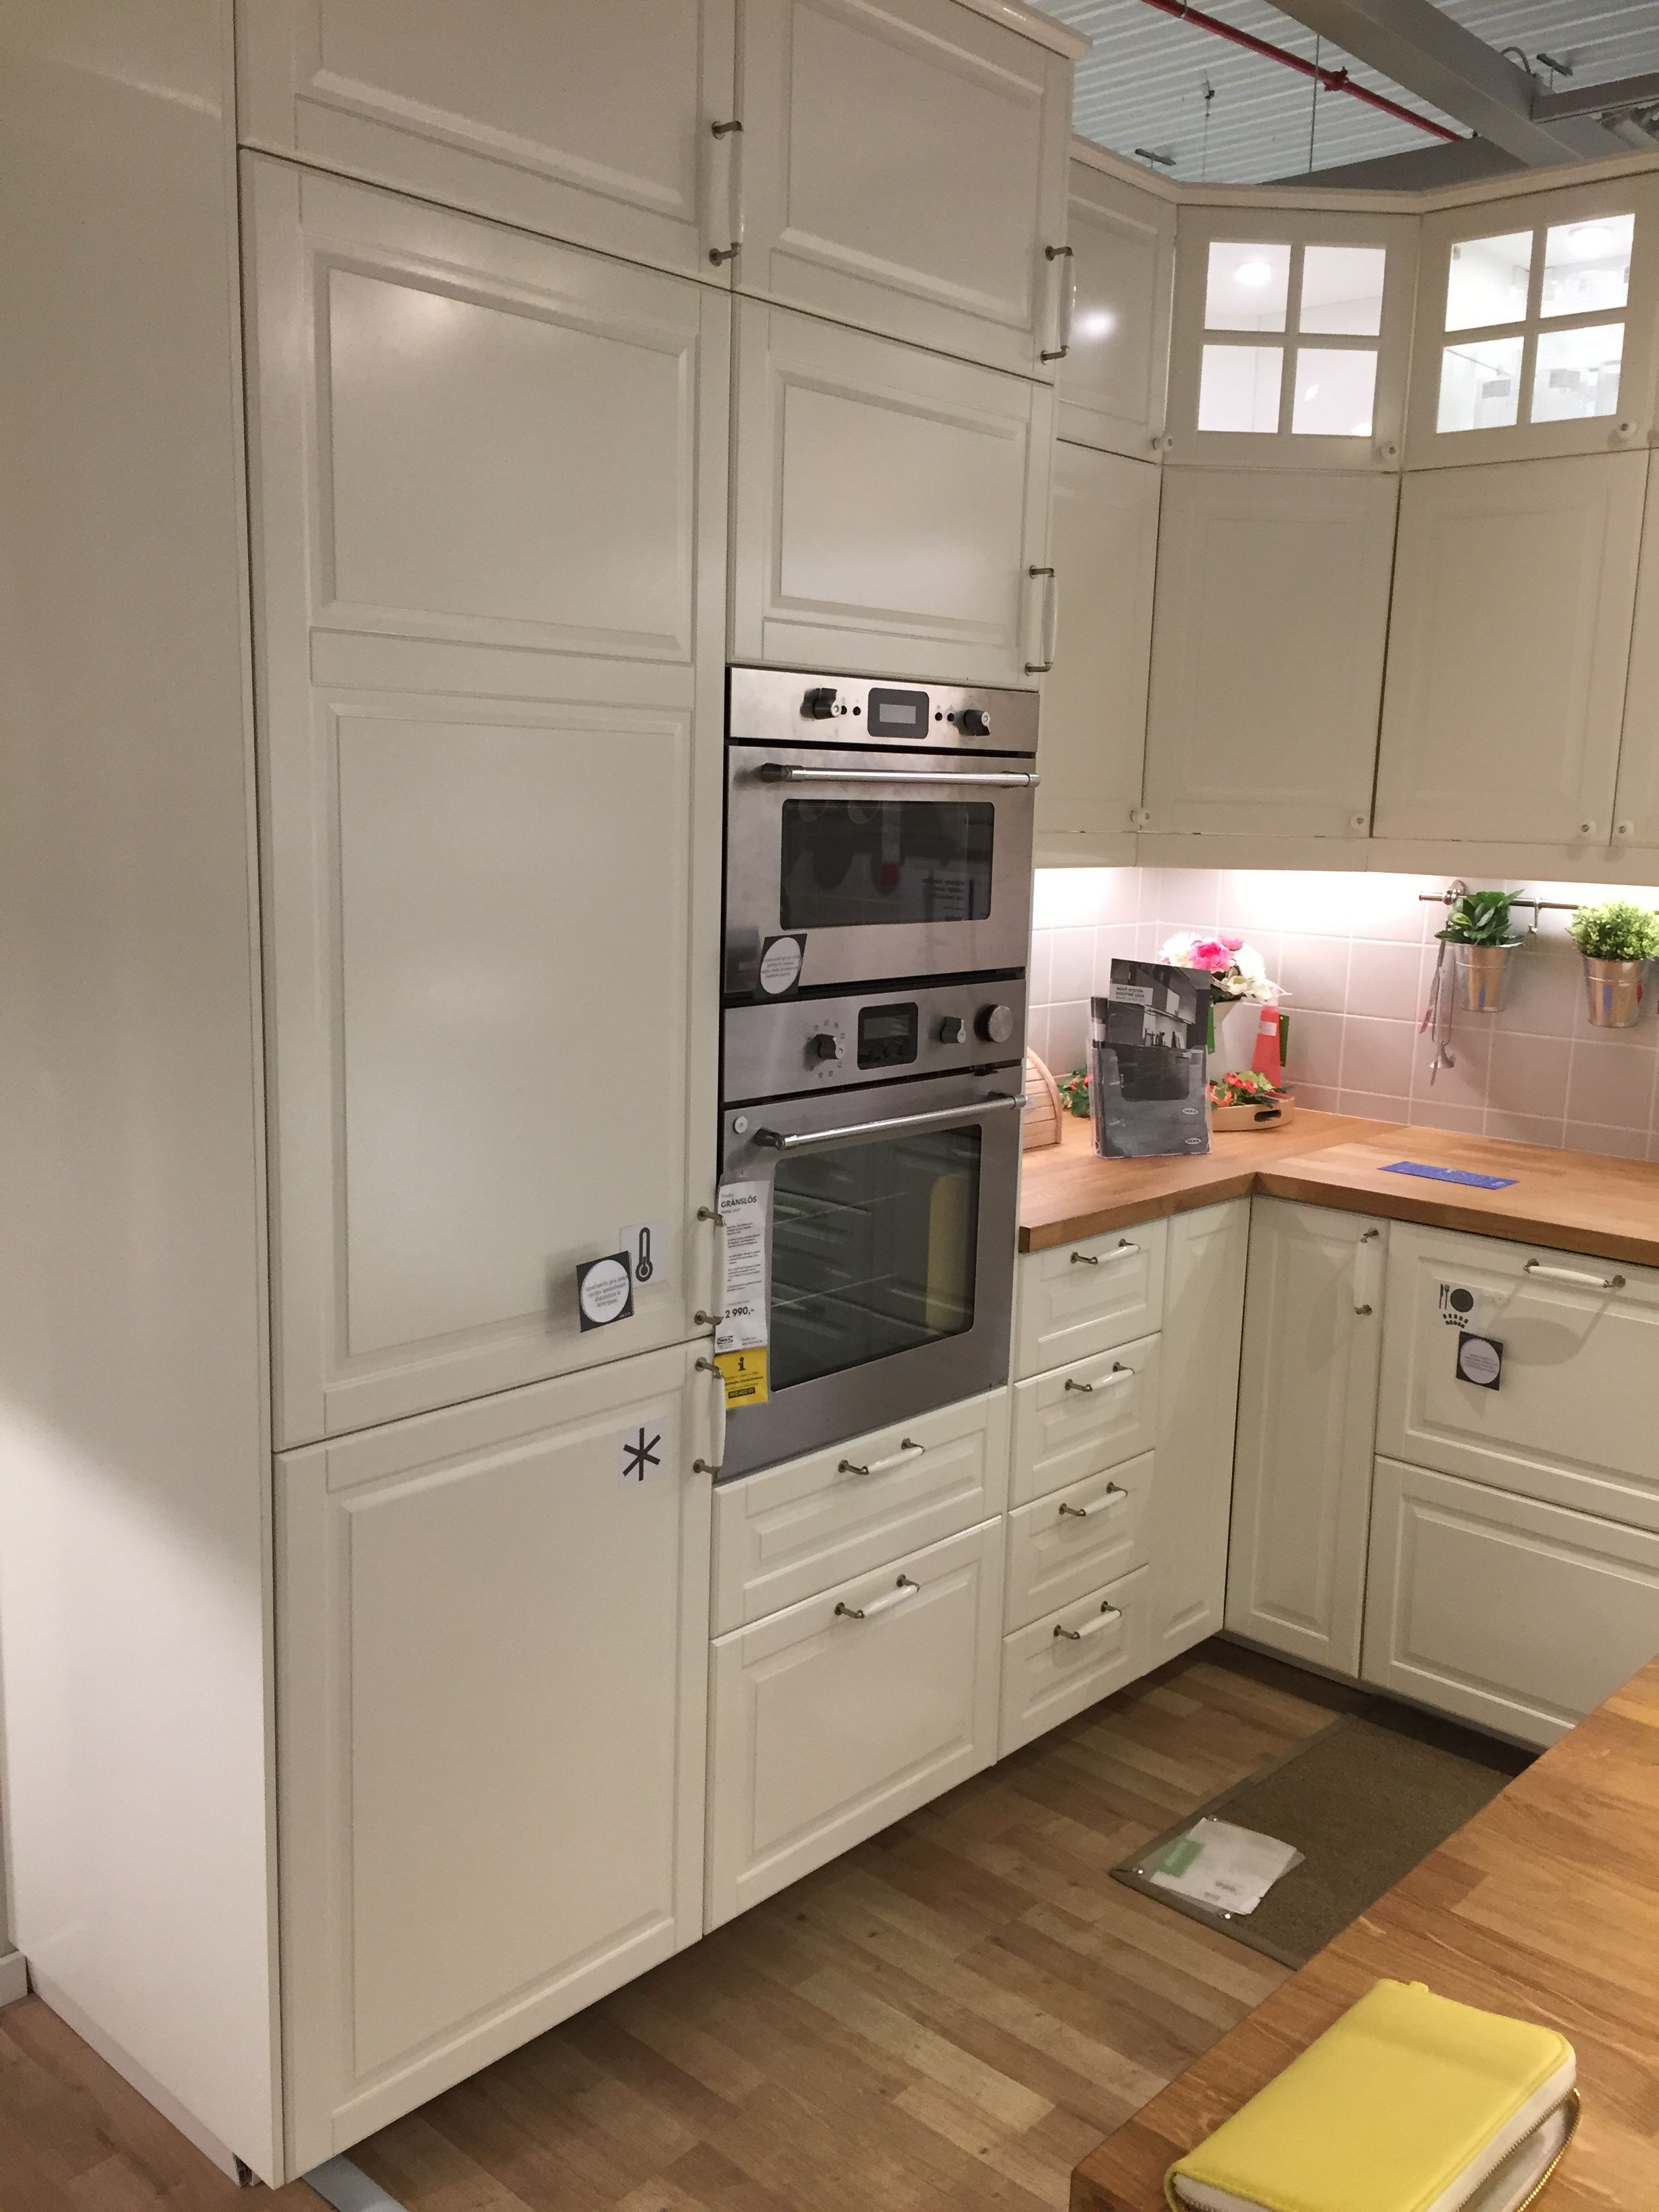 10x10 Bedroom Layout Ikea: Пин от пользователя Ana Stoeva на доске Kitchen Ideas в